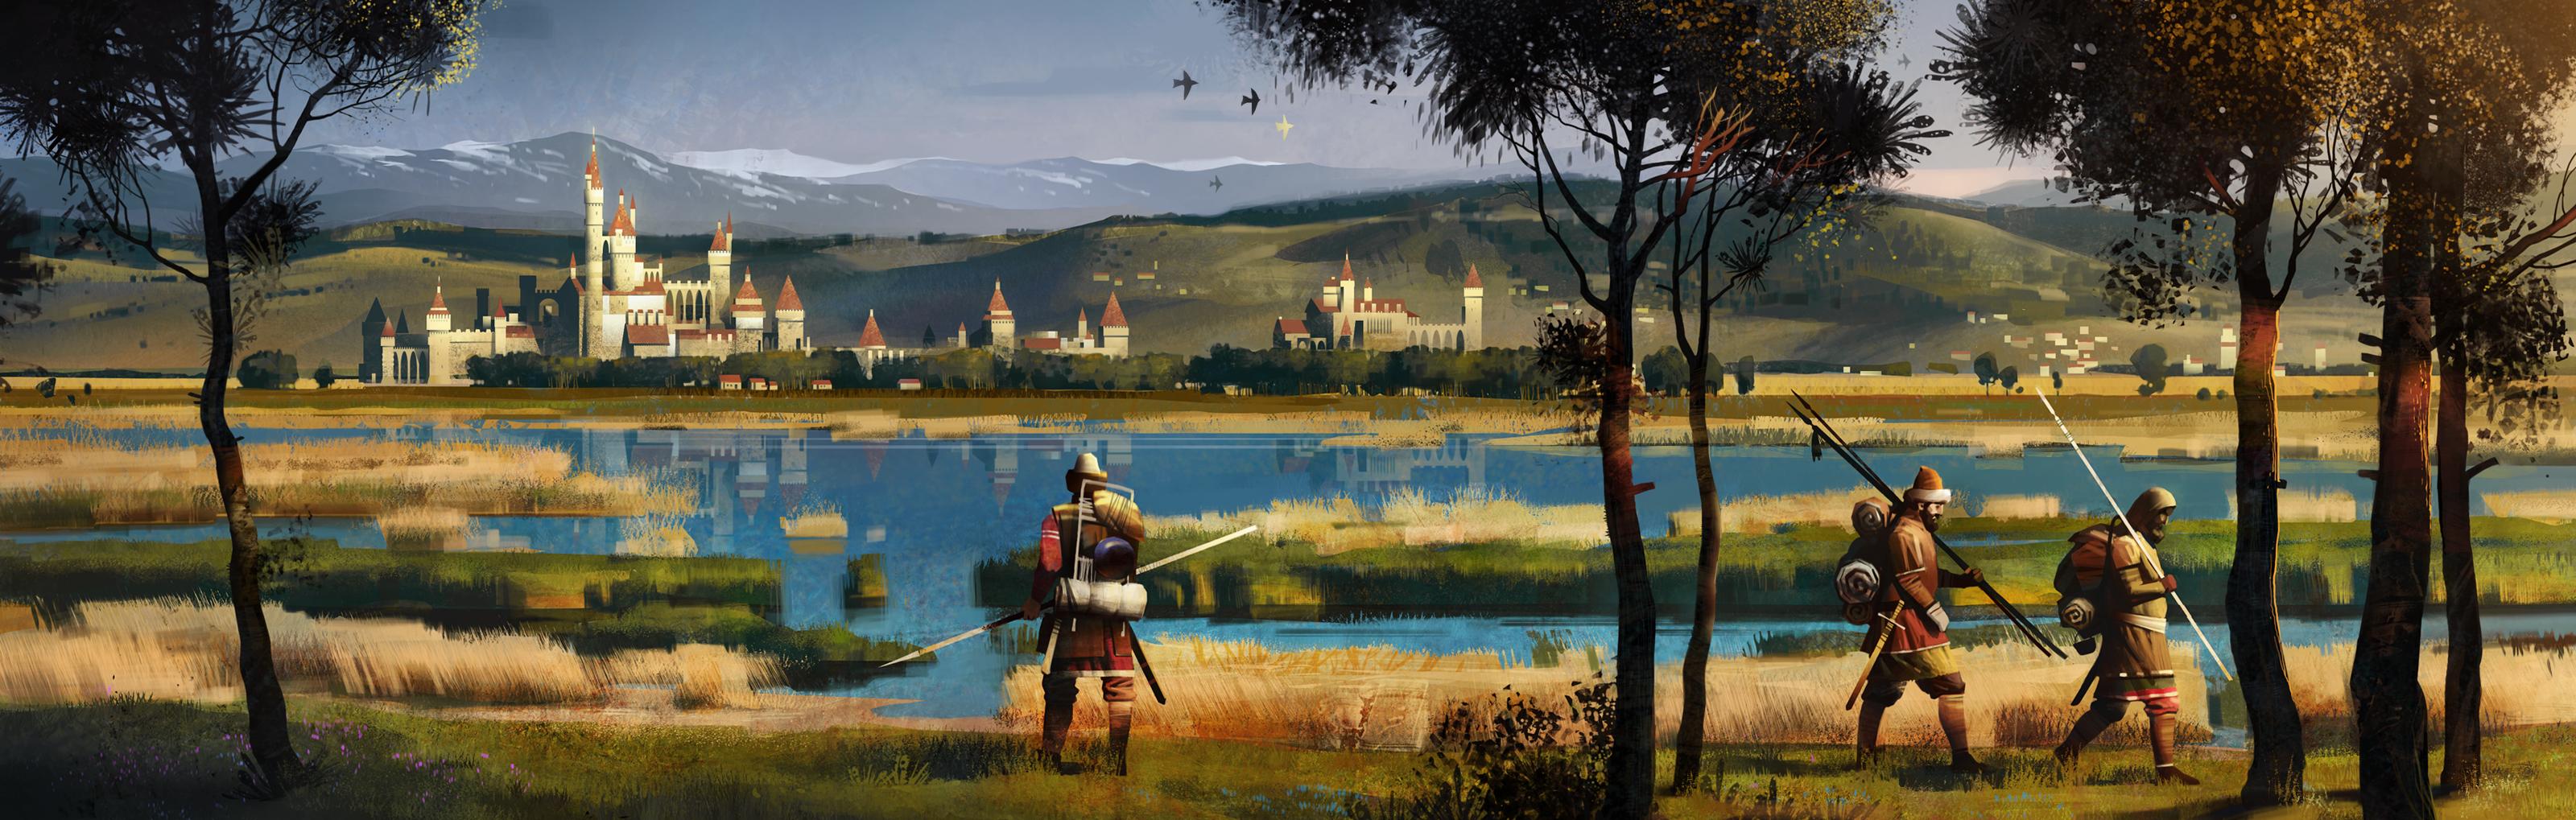 20 superbes illustrations en digital painting de Ivan Laliashvili